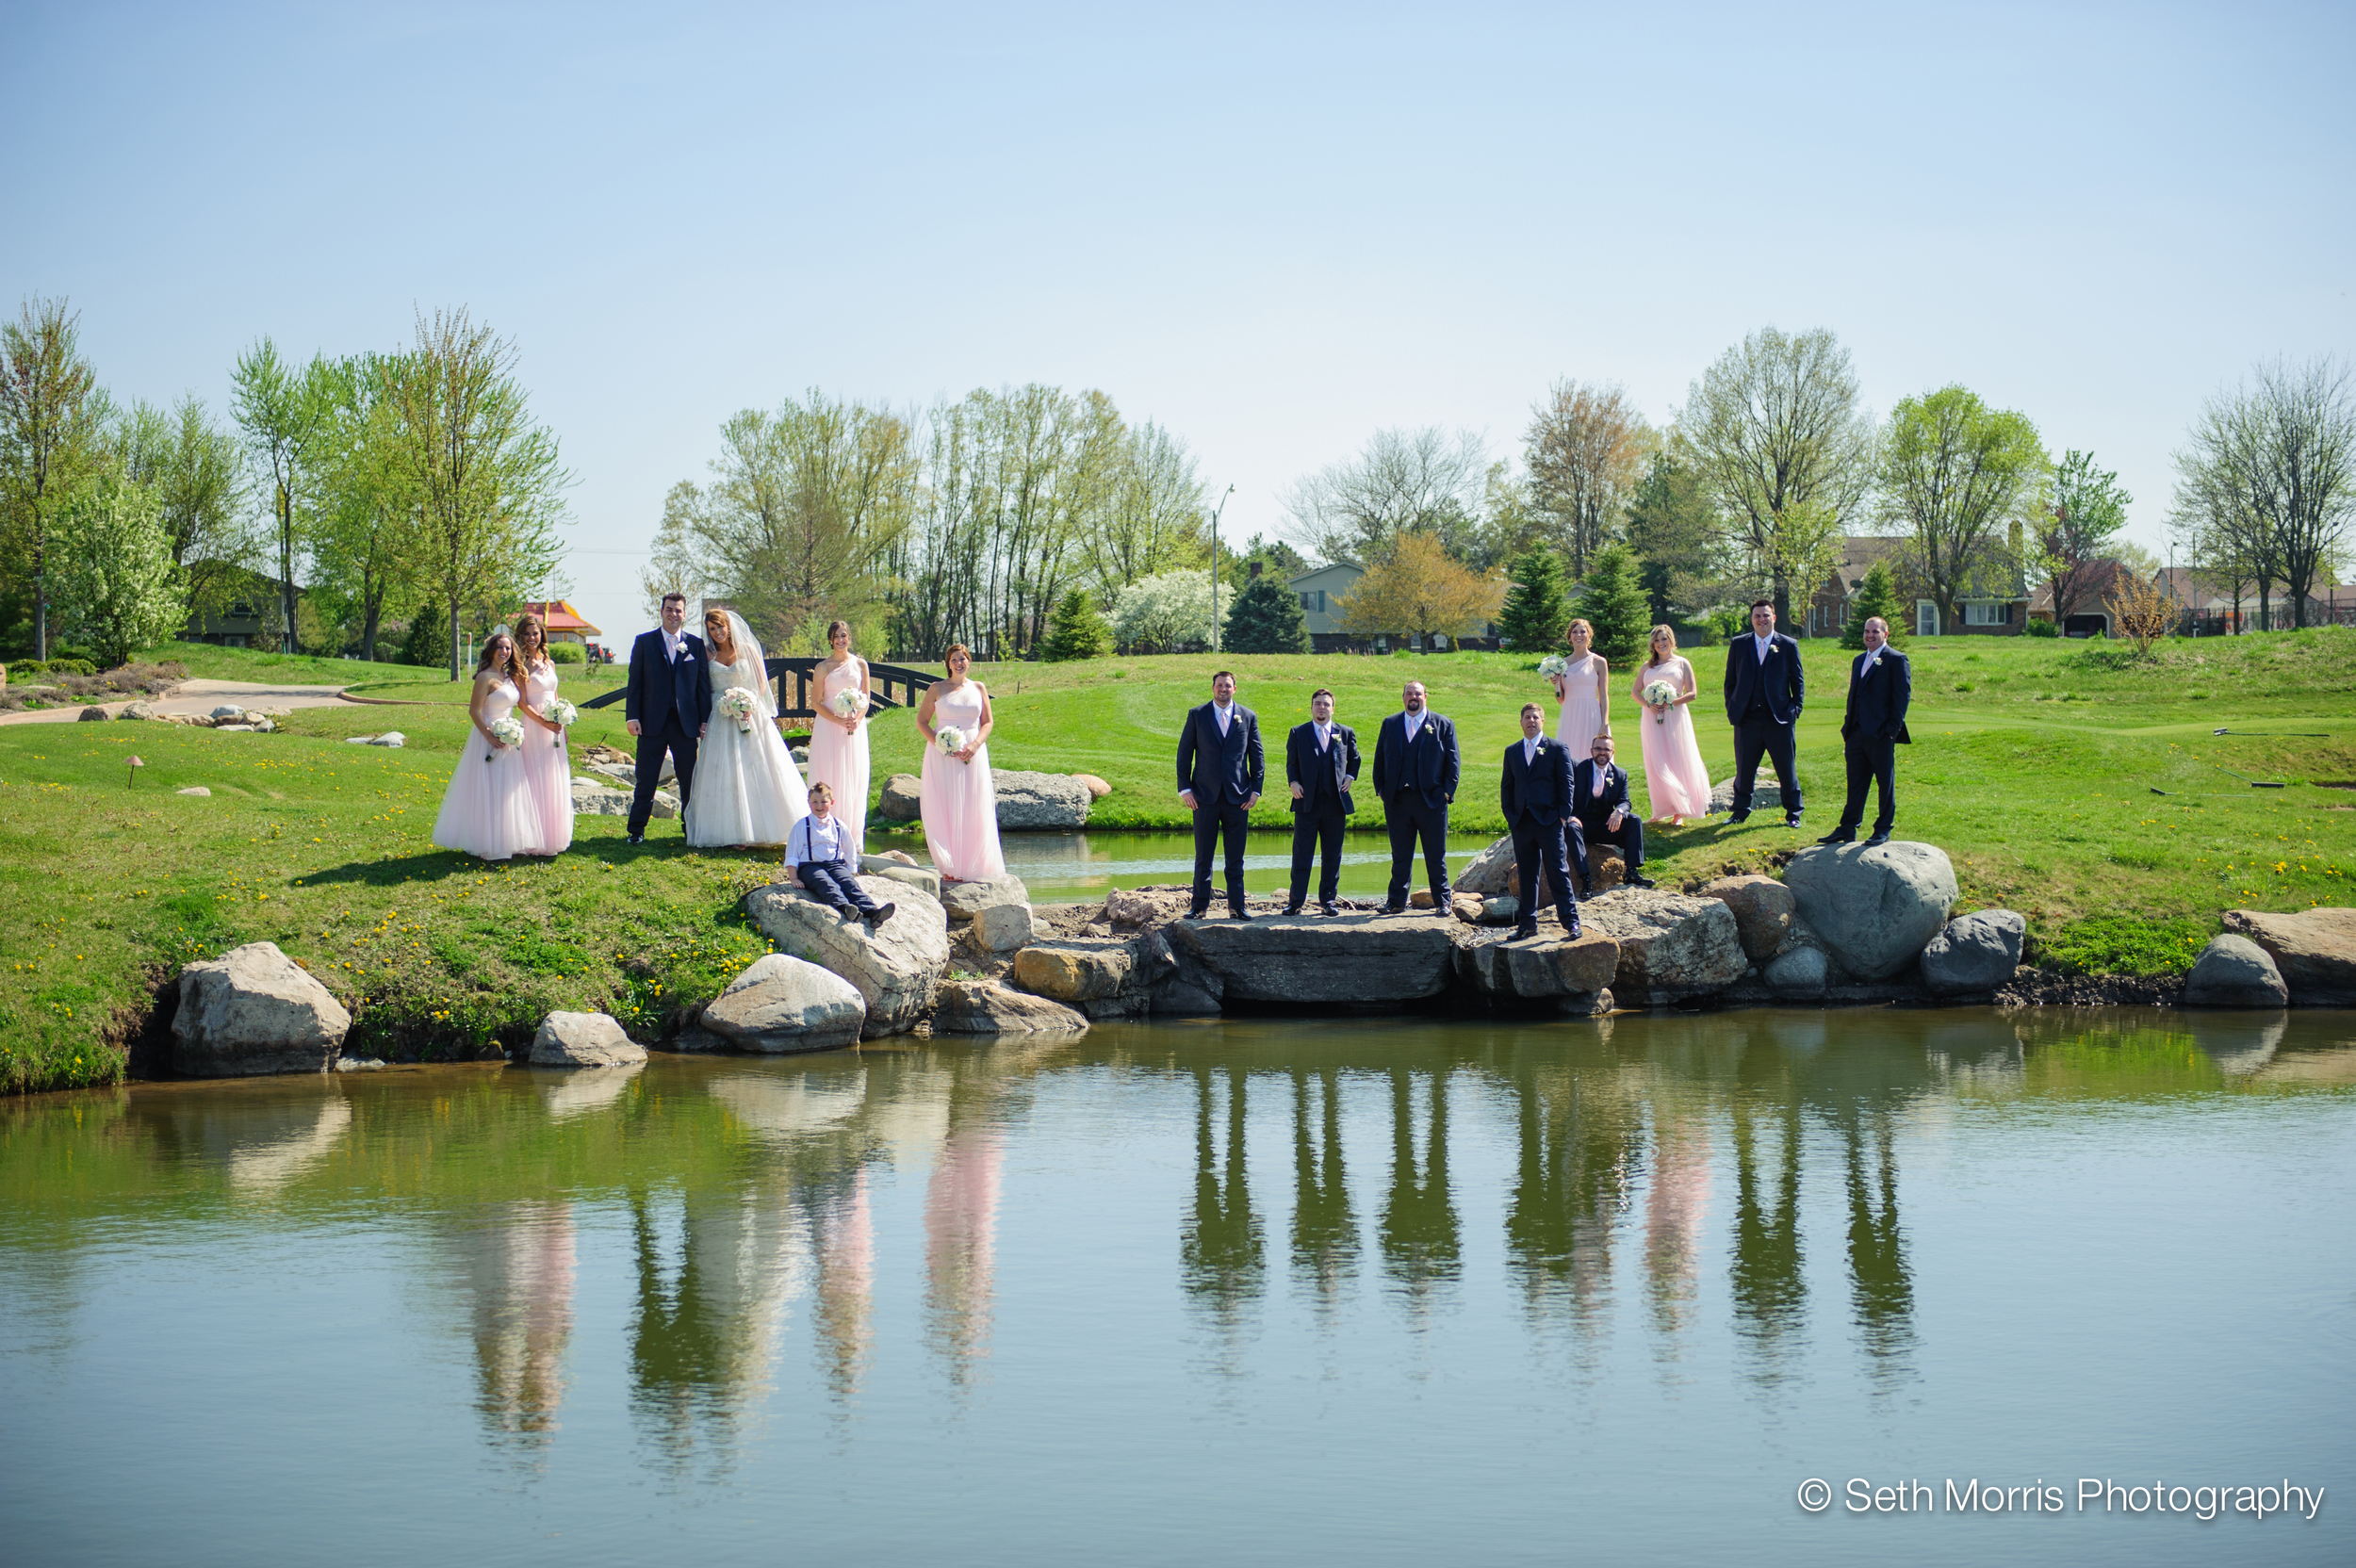 metamora-fields-wedding-photographer-peoria-131.jpg